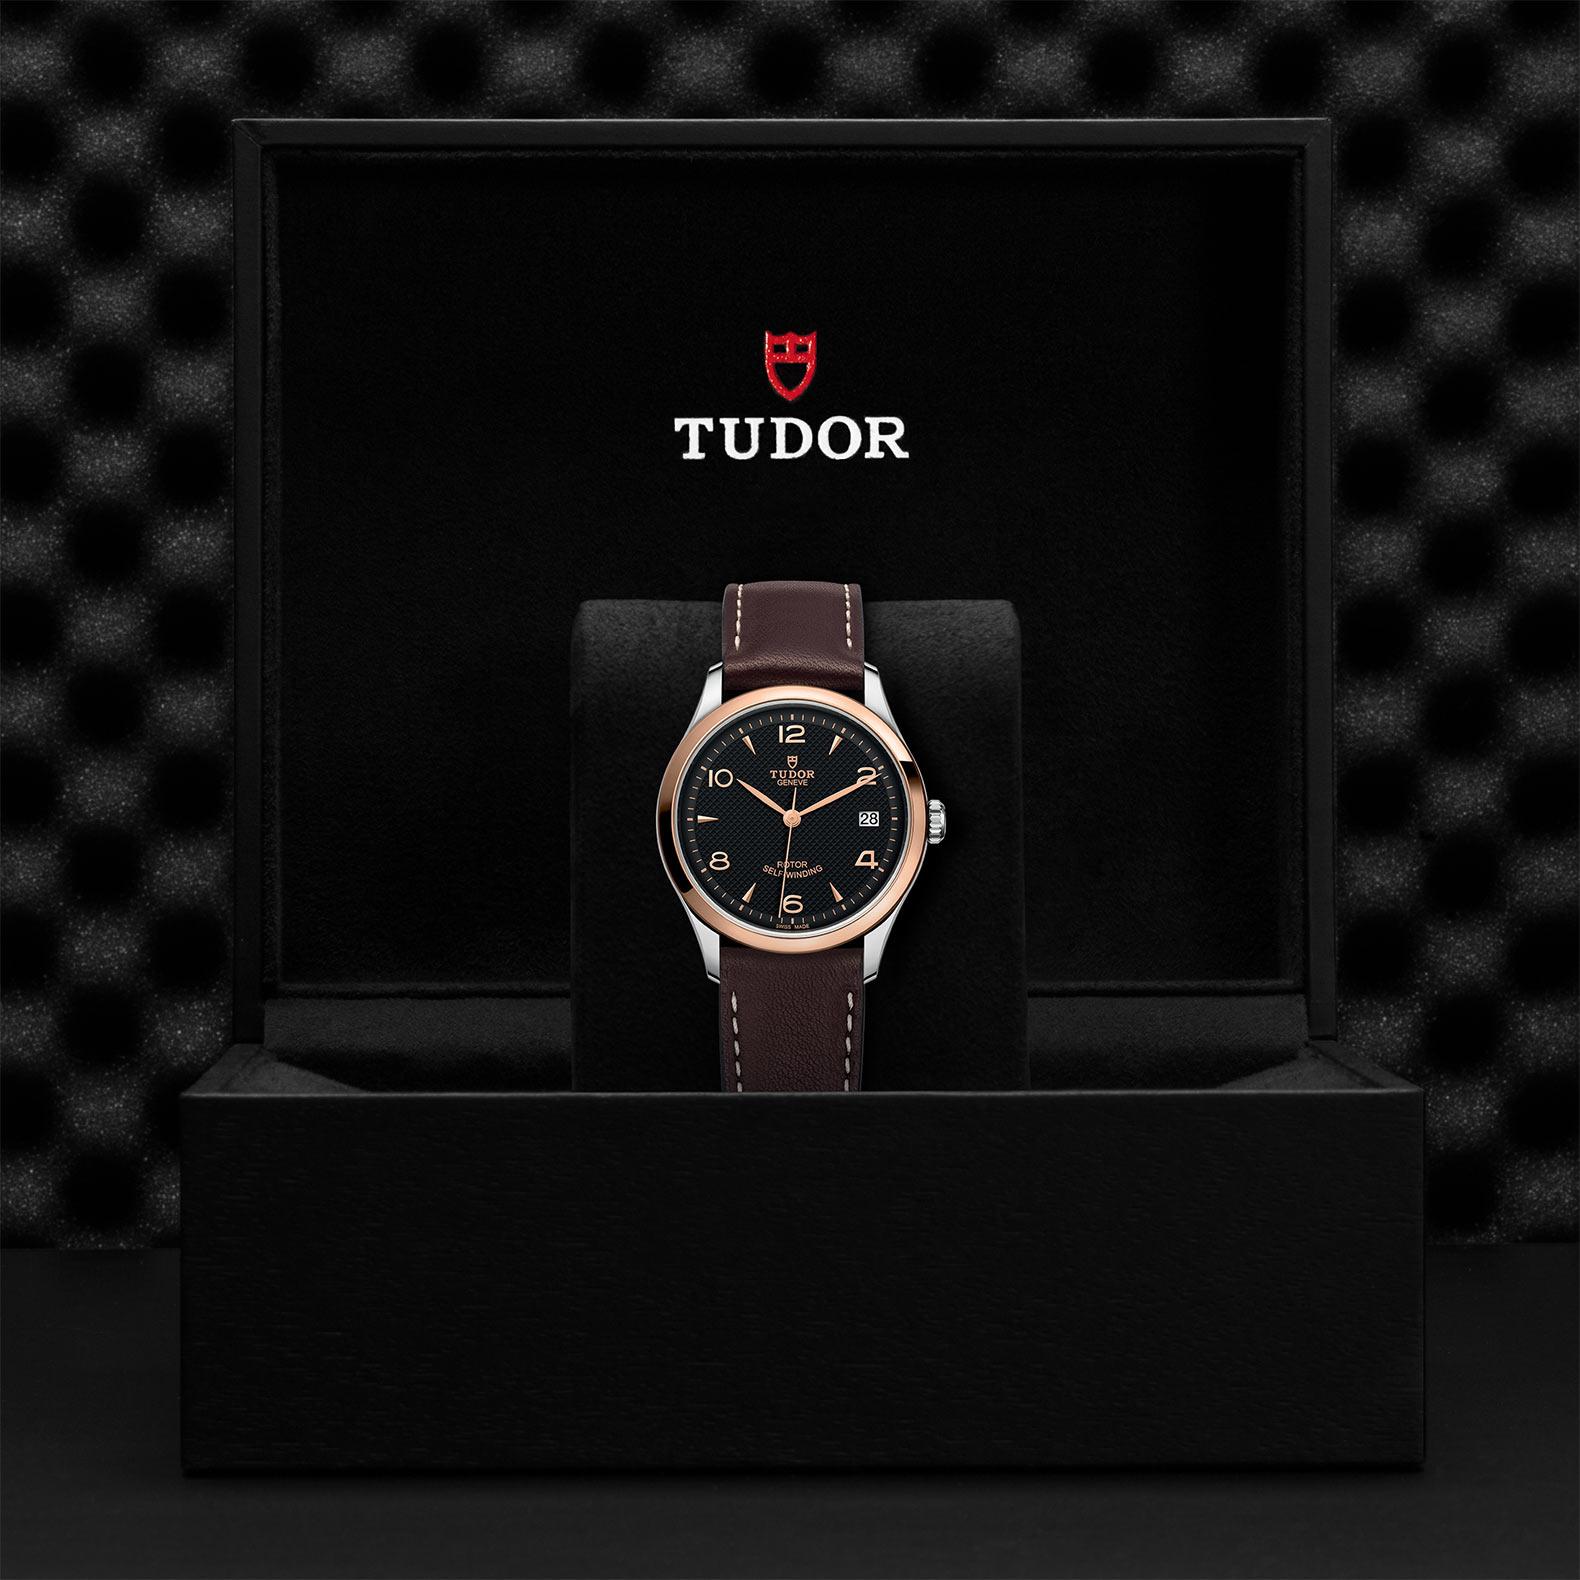 TUDOR 1926 - M91451-0007